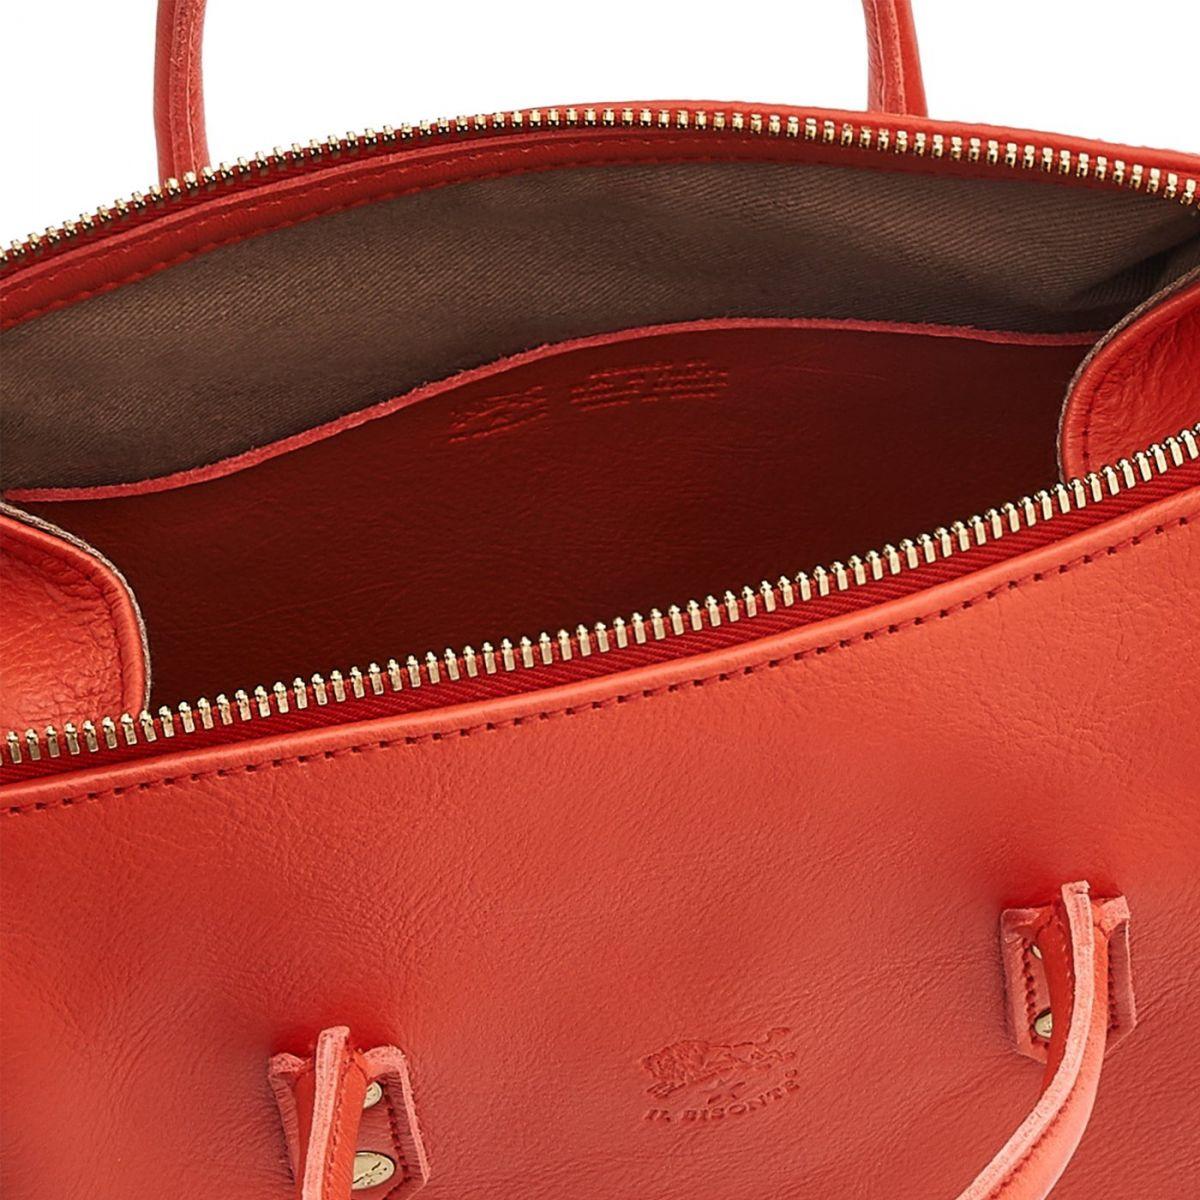 Women's Handbag Pratolino in Cowhide Leather BTH049 color Gazpacho | Details